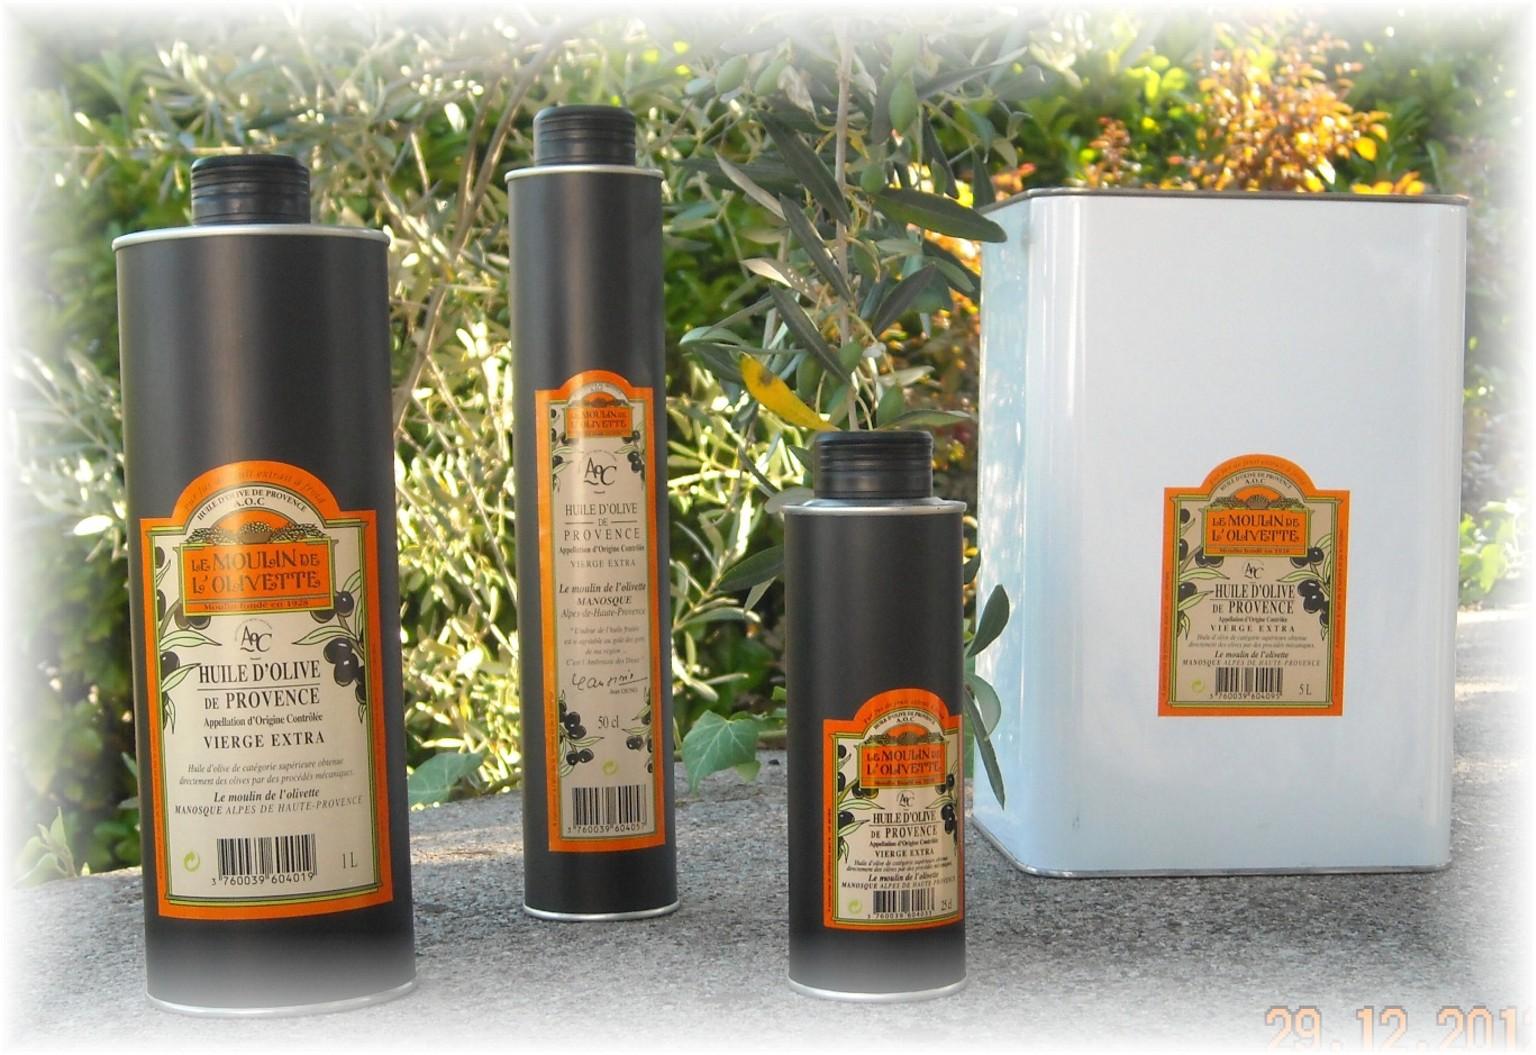 H olive v extra aoc provence huile d 39 olive aoc provence for Huile d olive salon de provence